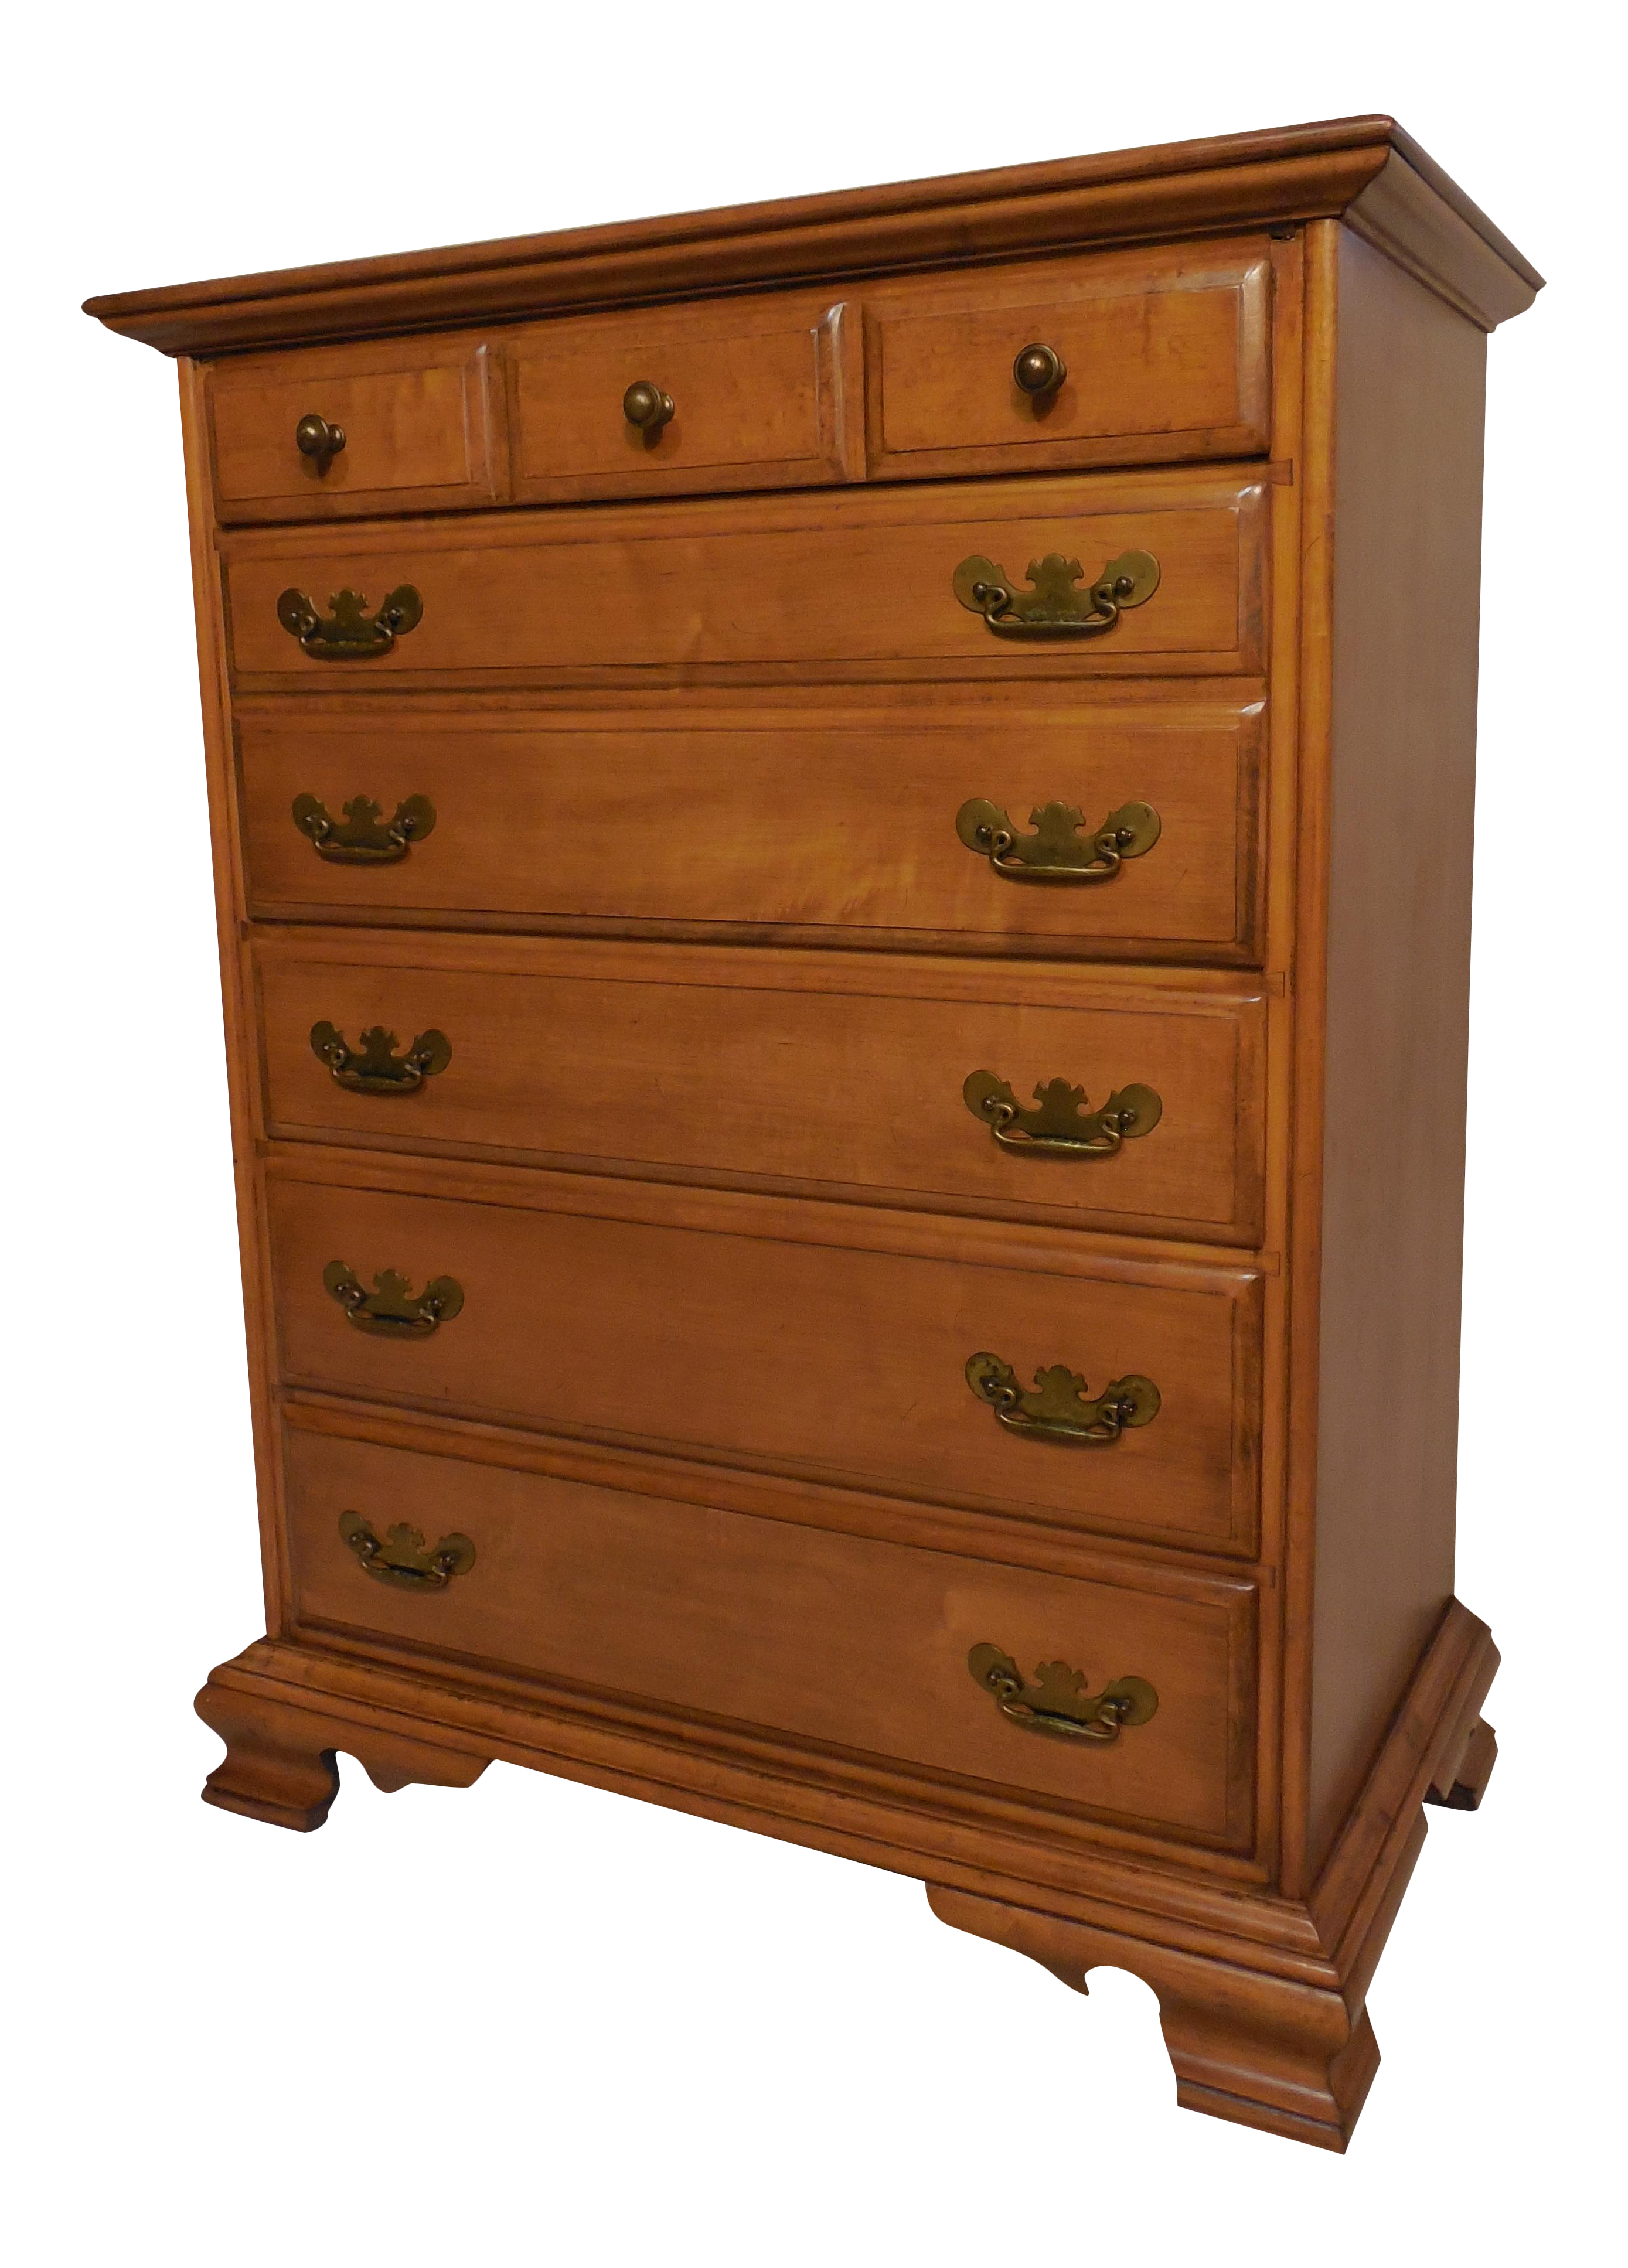 Conant Ball Chippendale Style Maple Dresser Chairish